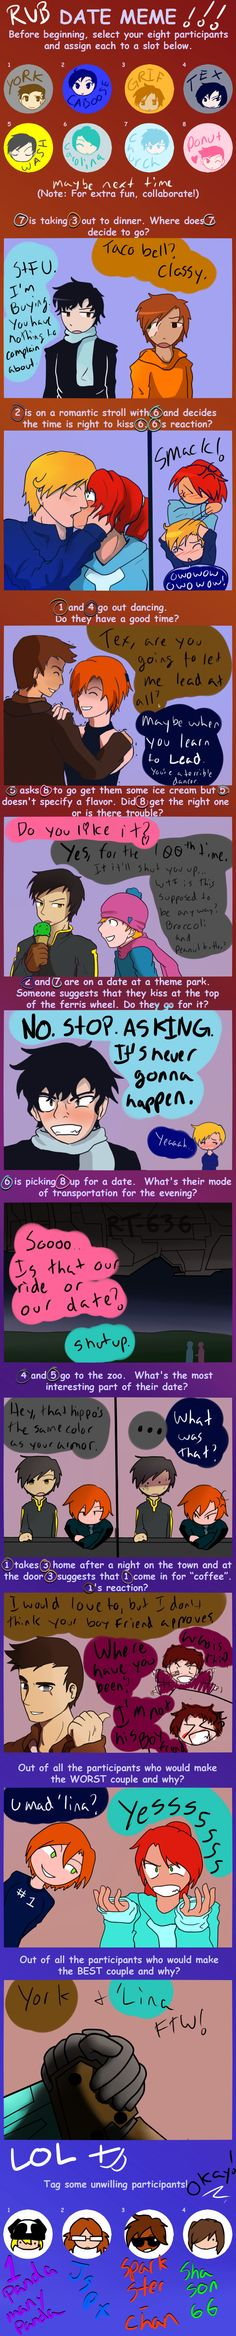 RvB Date Meme by CaptainTimber.deviantart.com on @deviantART    it's a bit odd but very IC